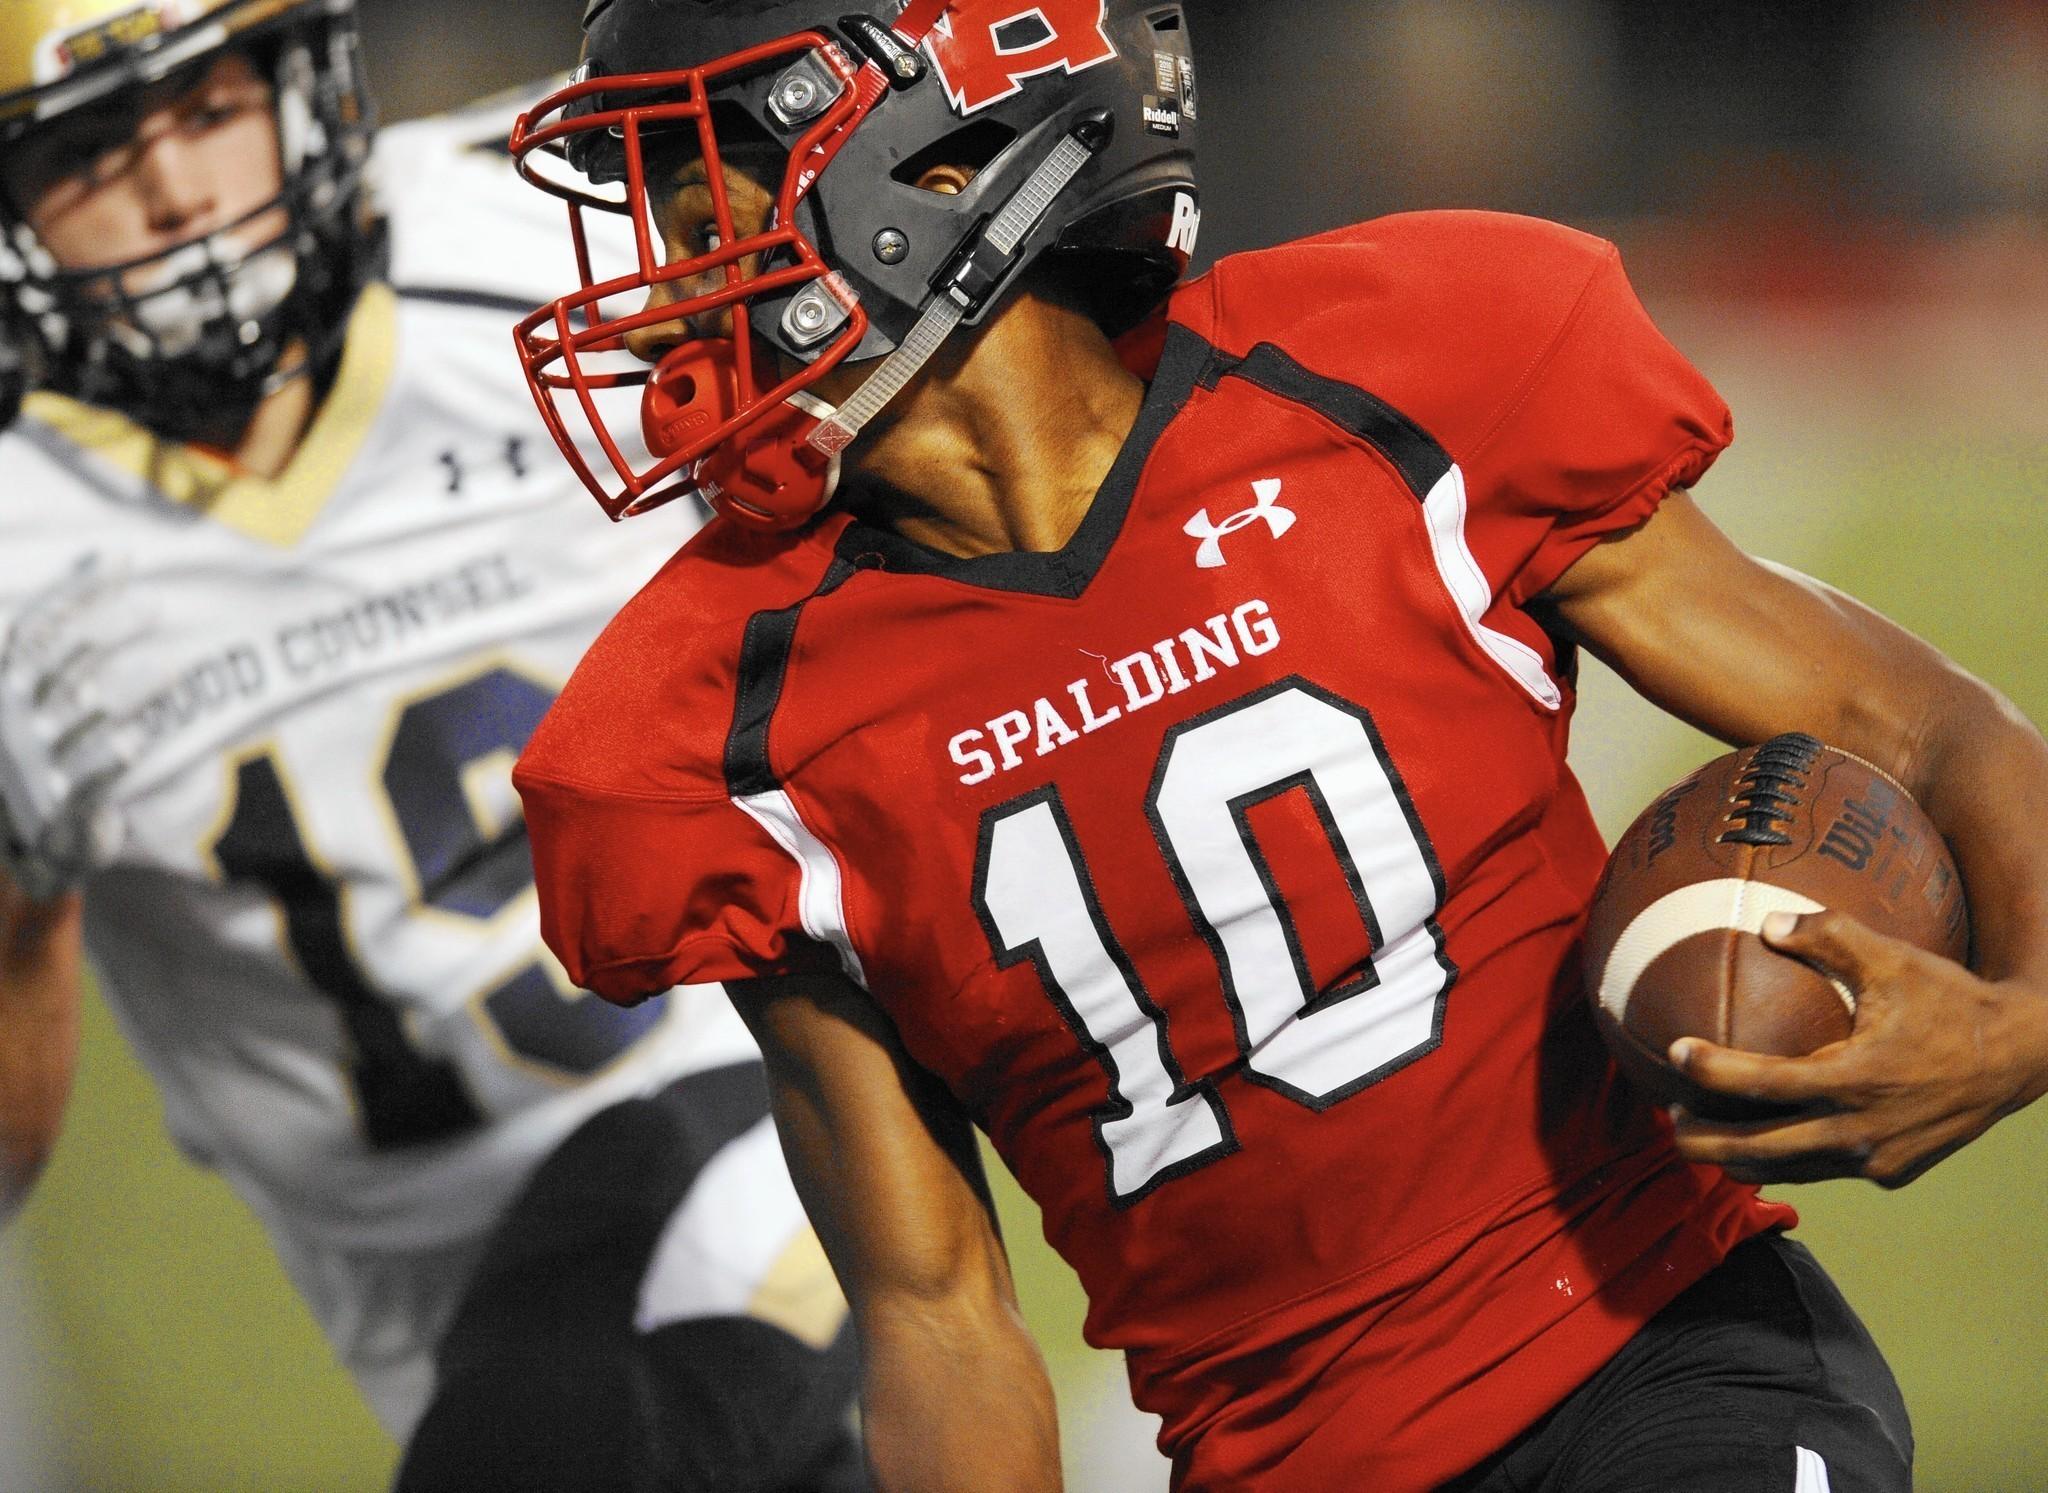 Spalding University Athletics